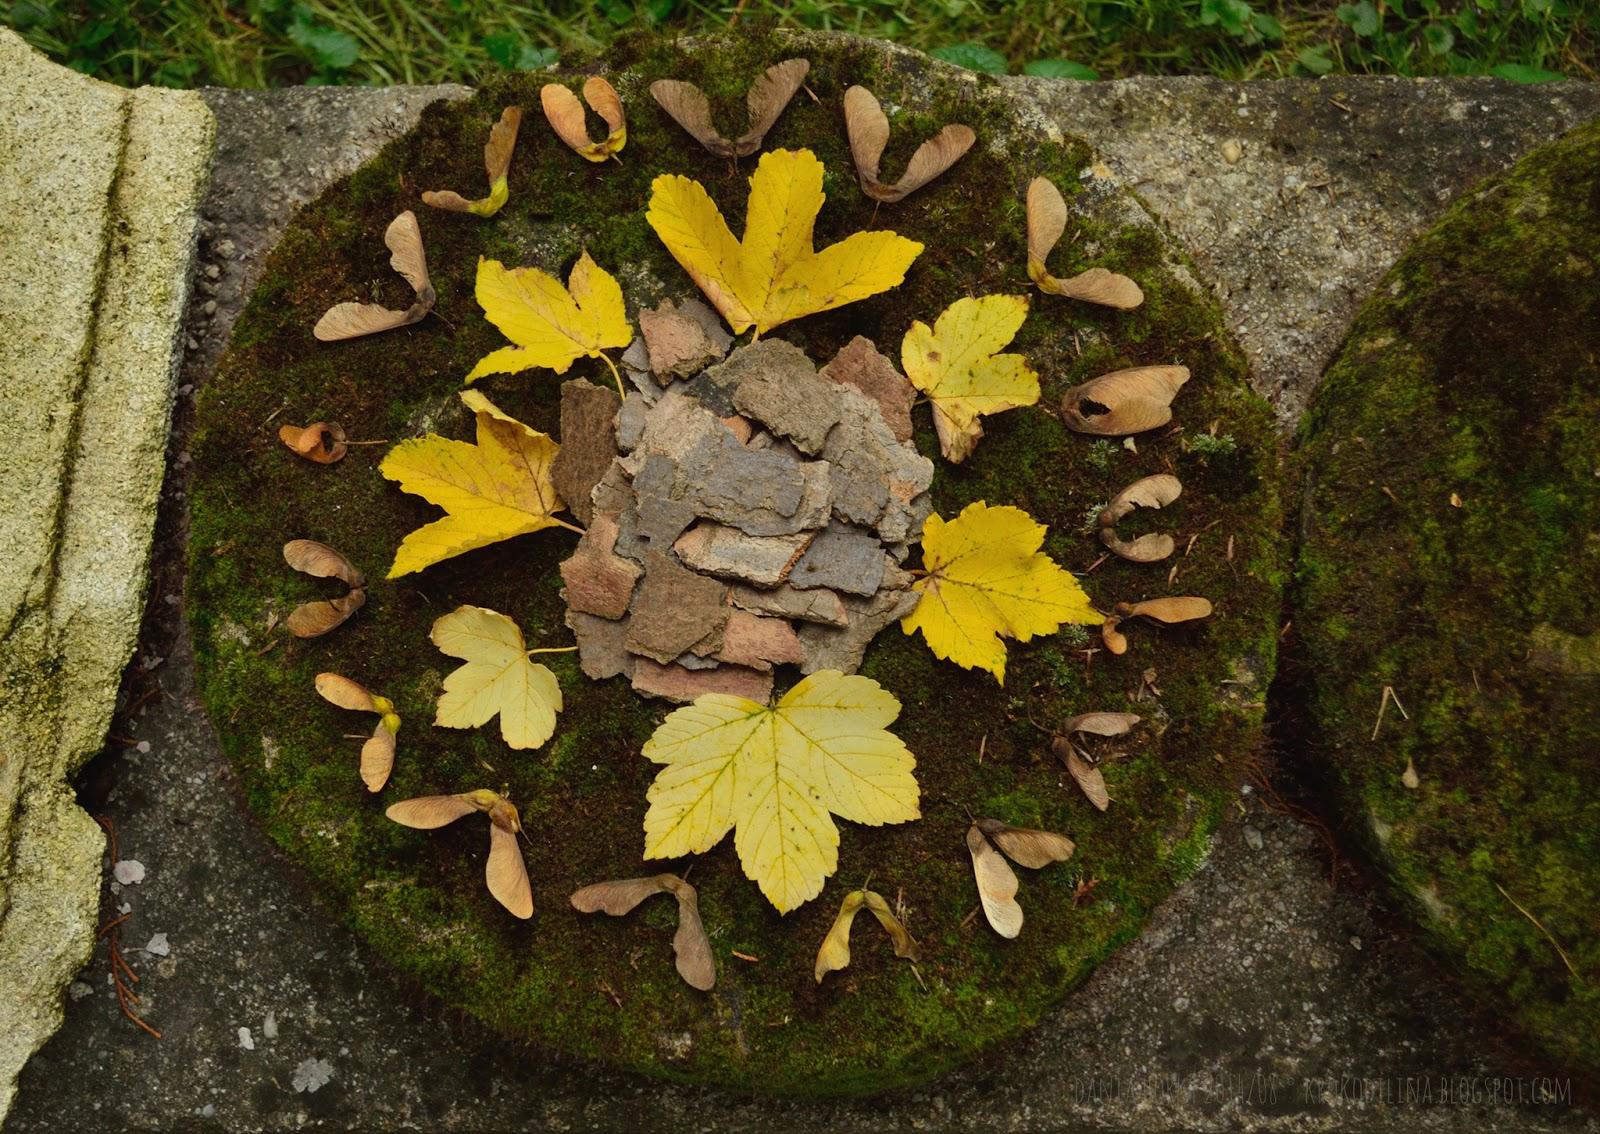 Wald sinnen naturmandala 2 - Basteln mit naturmaterialien wald ...